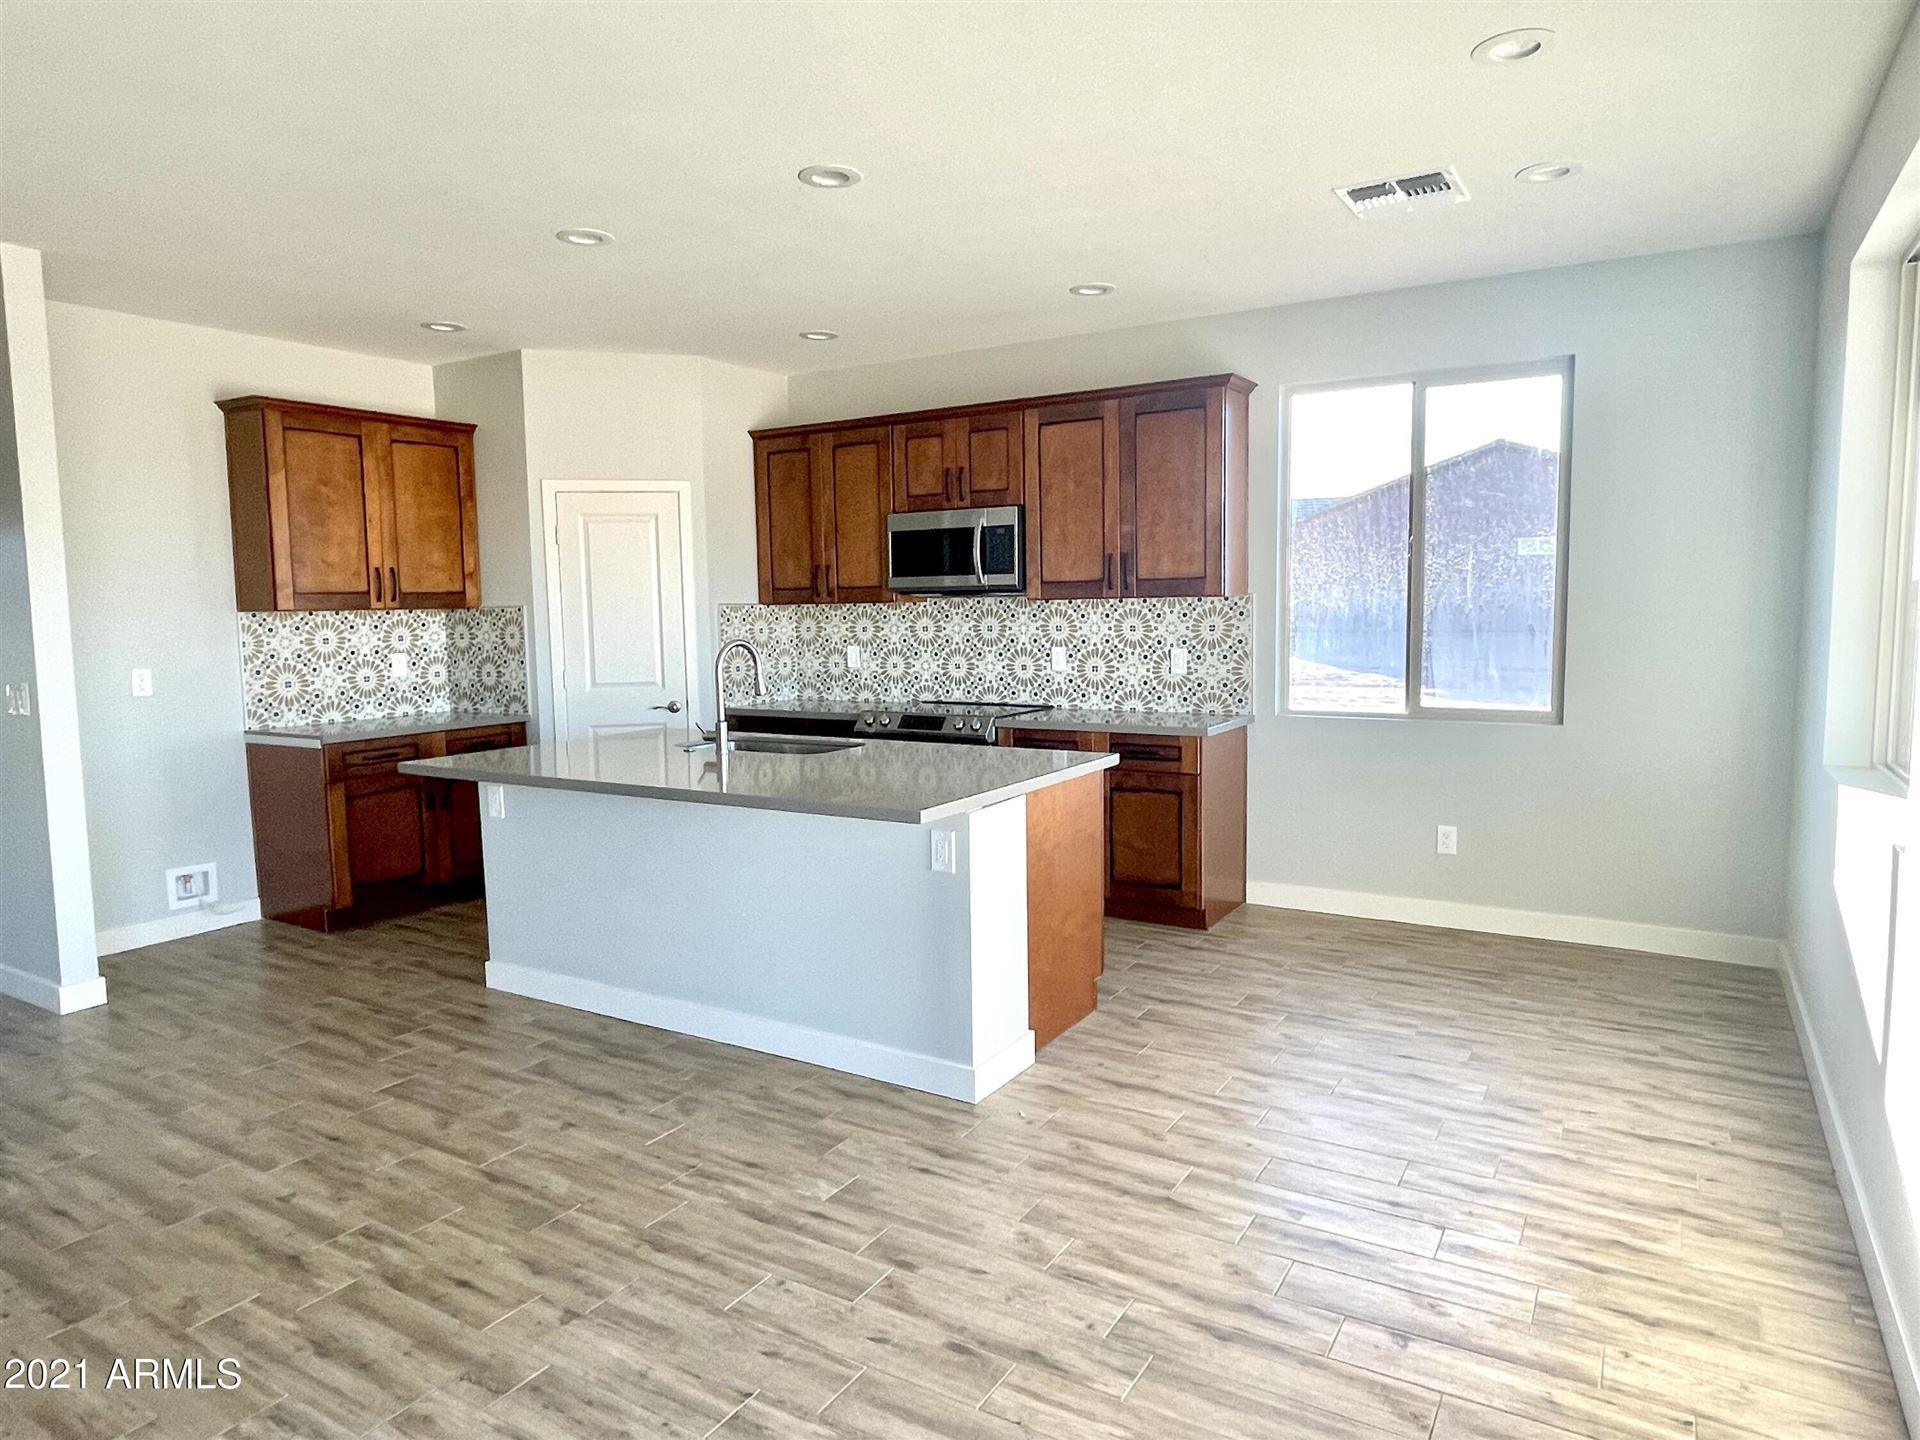 Photo of 25630 W GAMBIT Trail, Wittmann, AZ 85361 (MLS # 6300694)